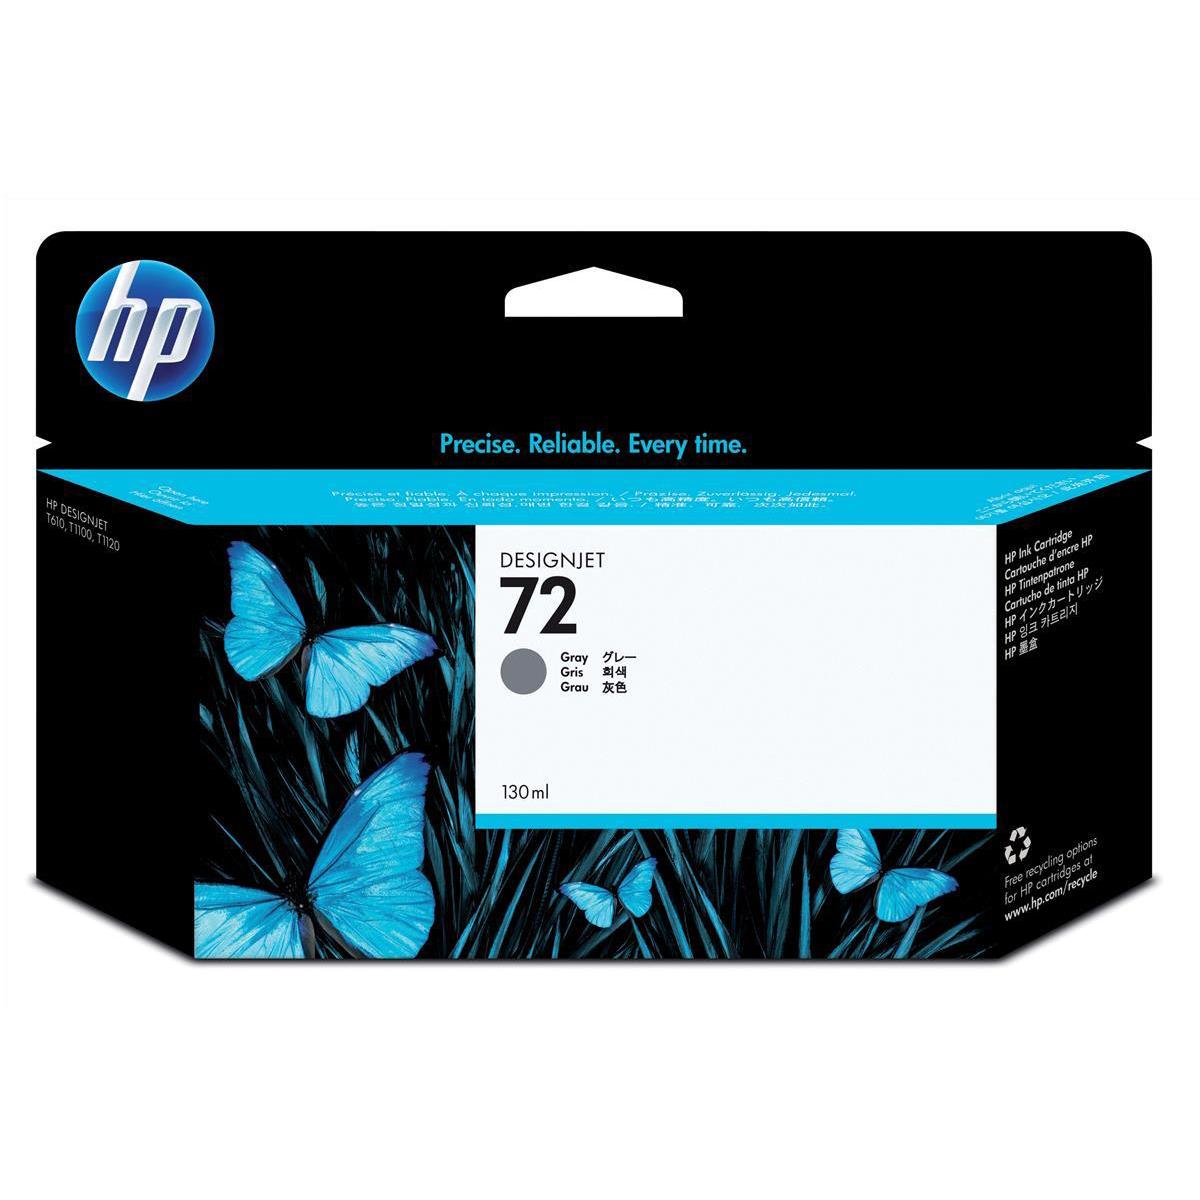 Hewlett Packard [HP] No.72 Inkjet Cartridge High Yield 130ml Grey Ref C9374A